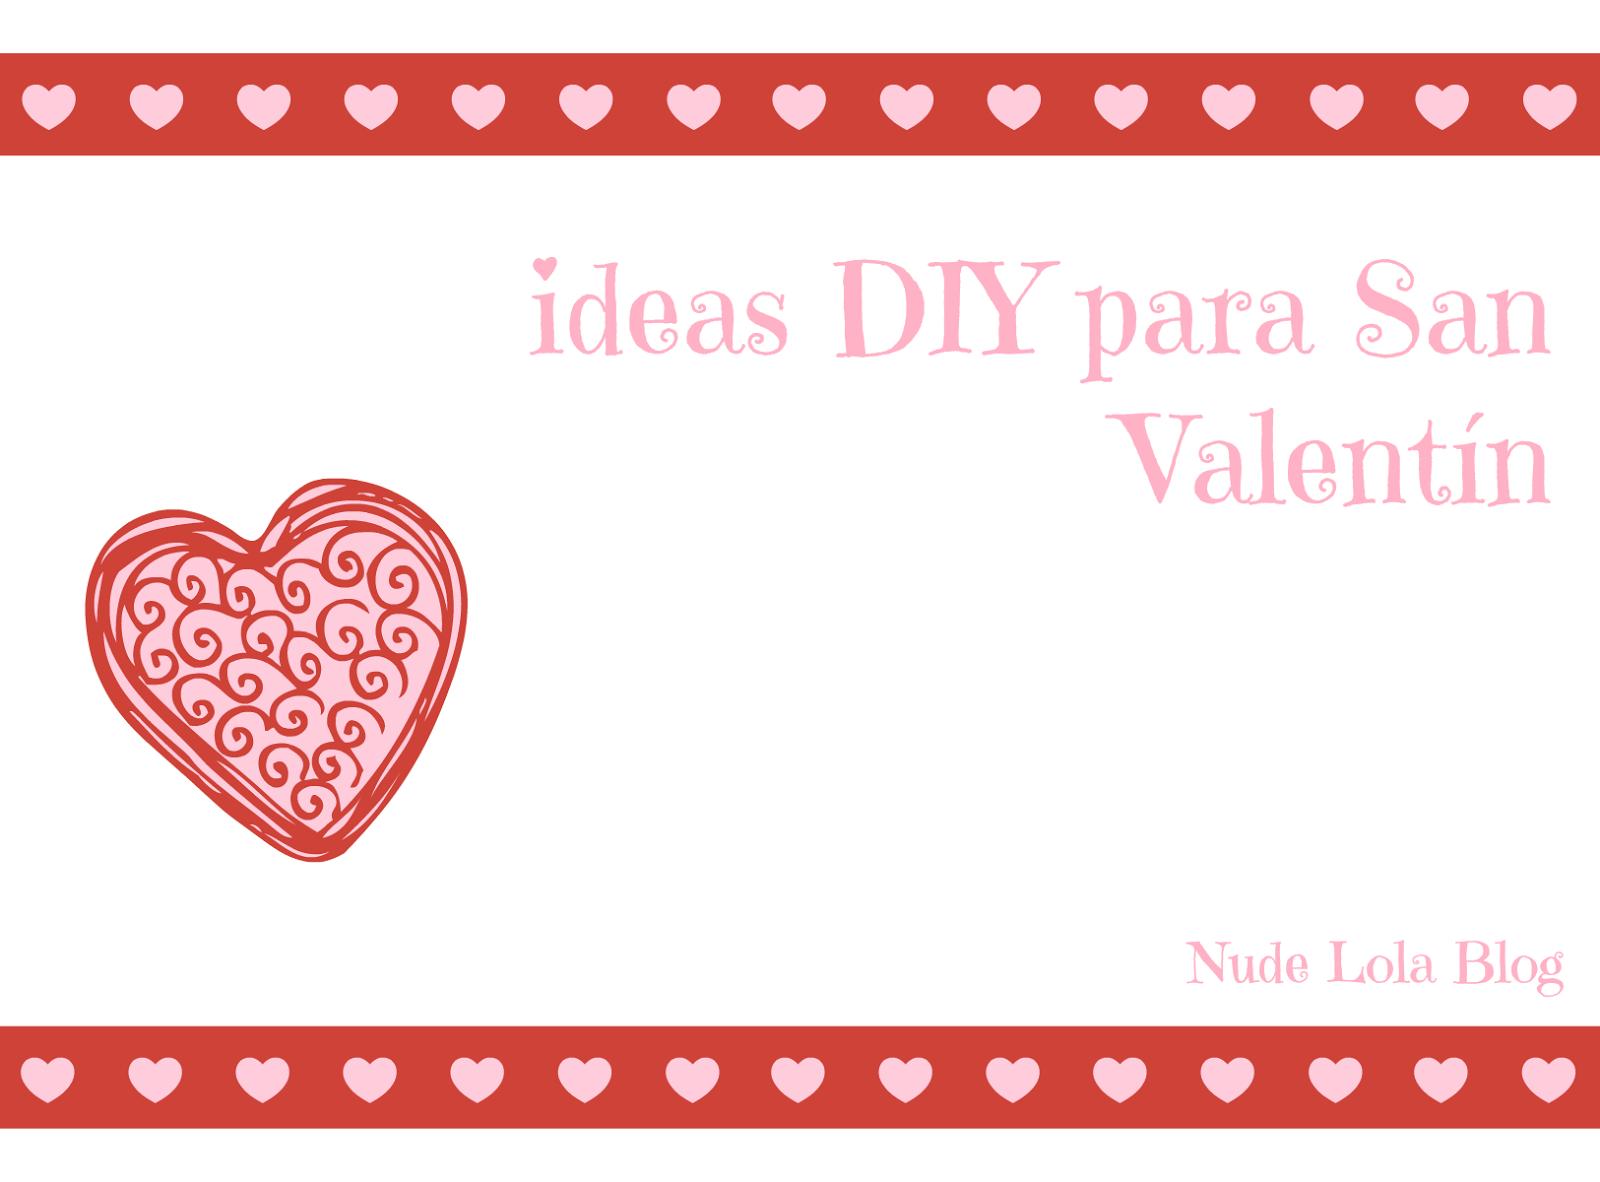 DIY_san_valentin_ideas_regalar_nudelolablog_01